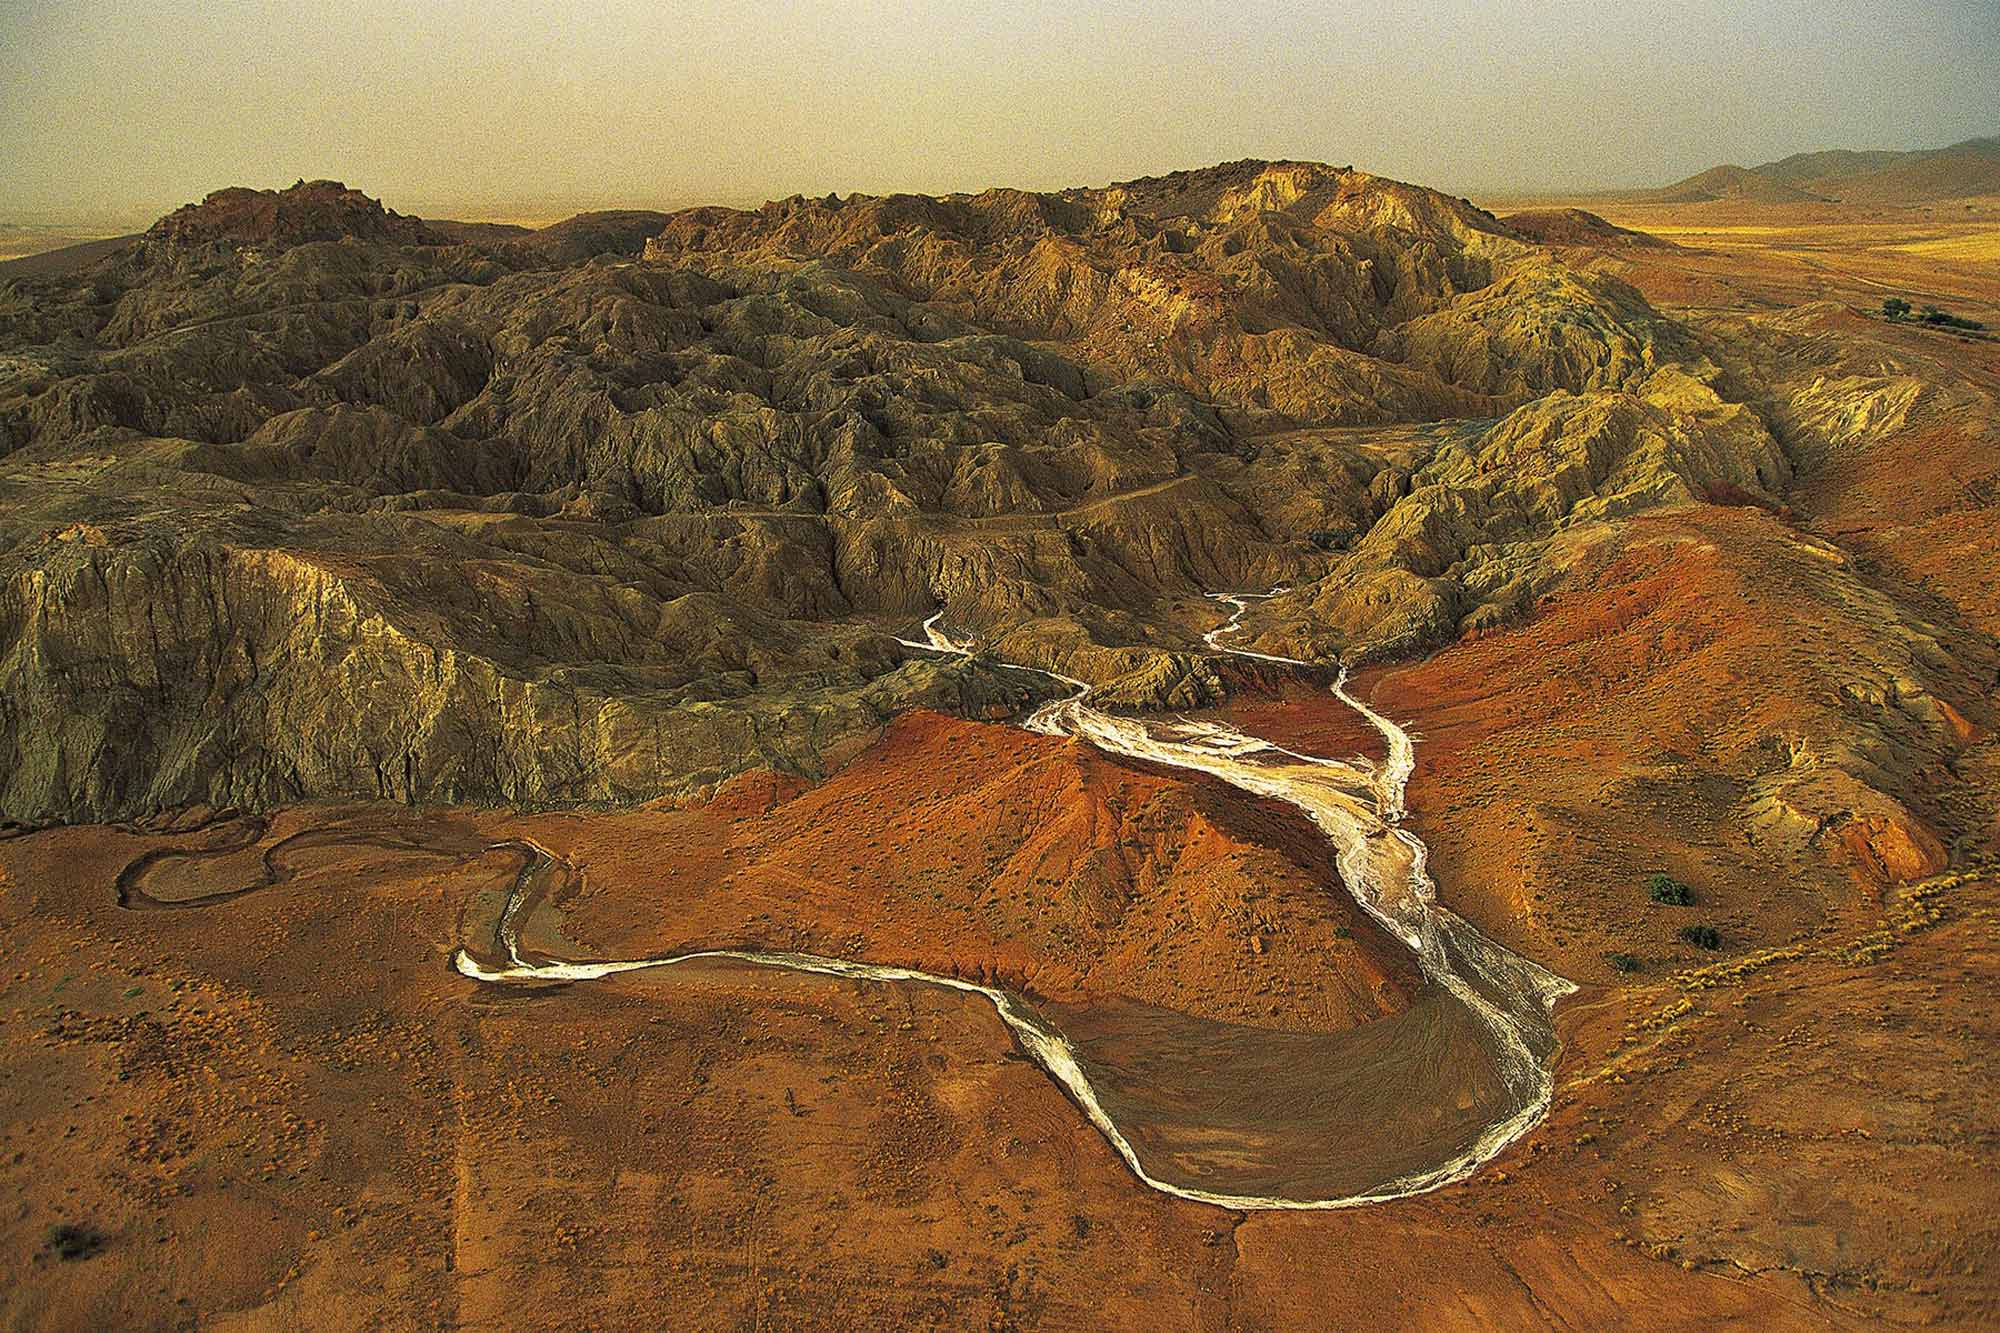 Rocher de Sel, Algérie - Yann Arthus-Bertrand